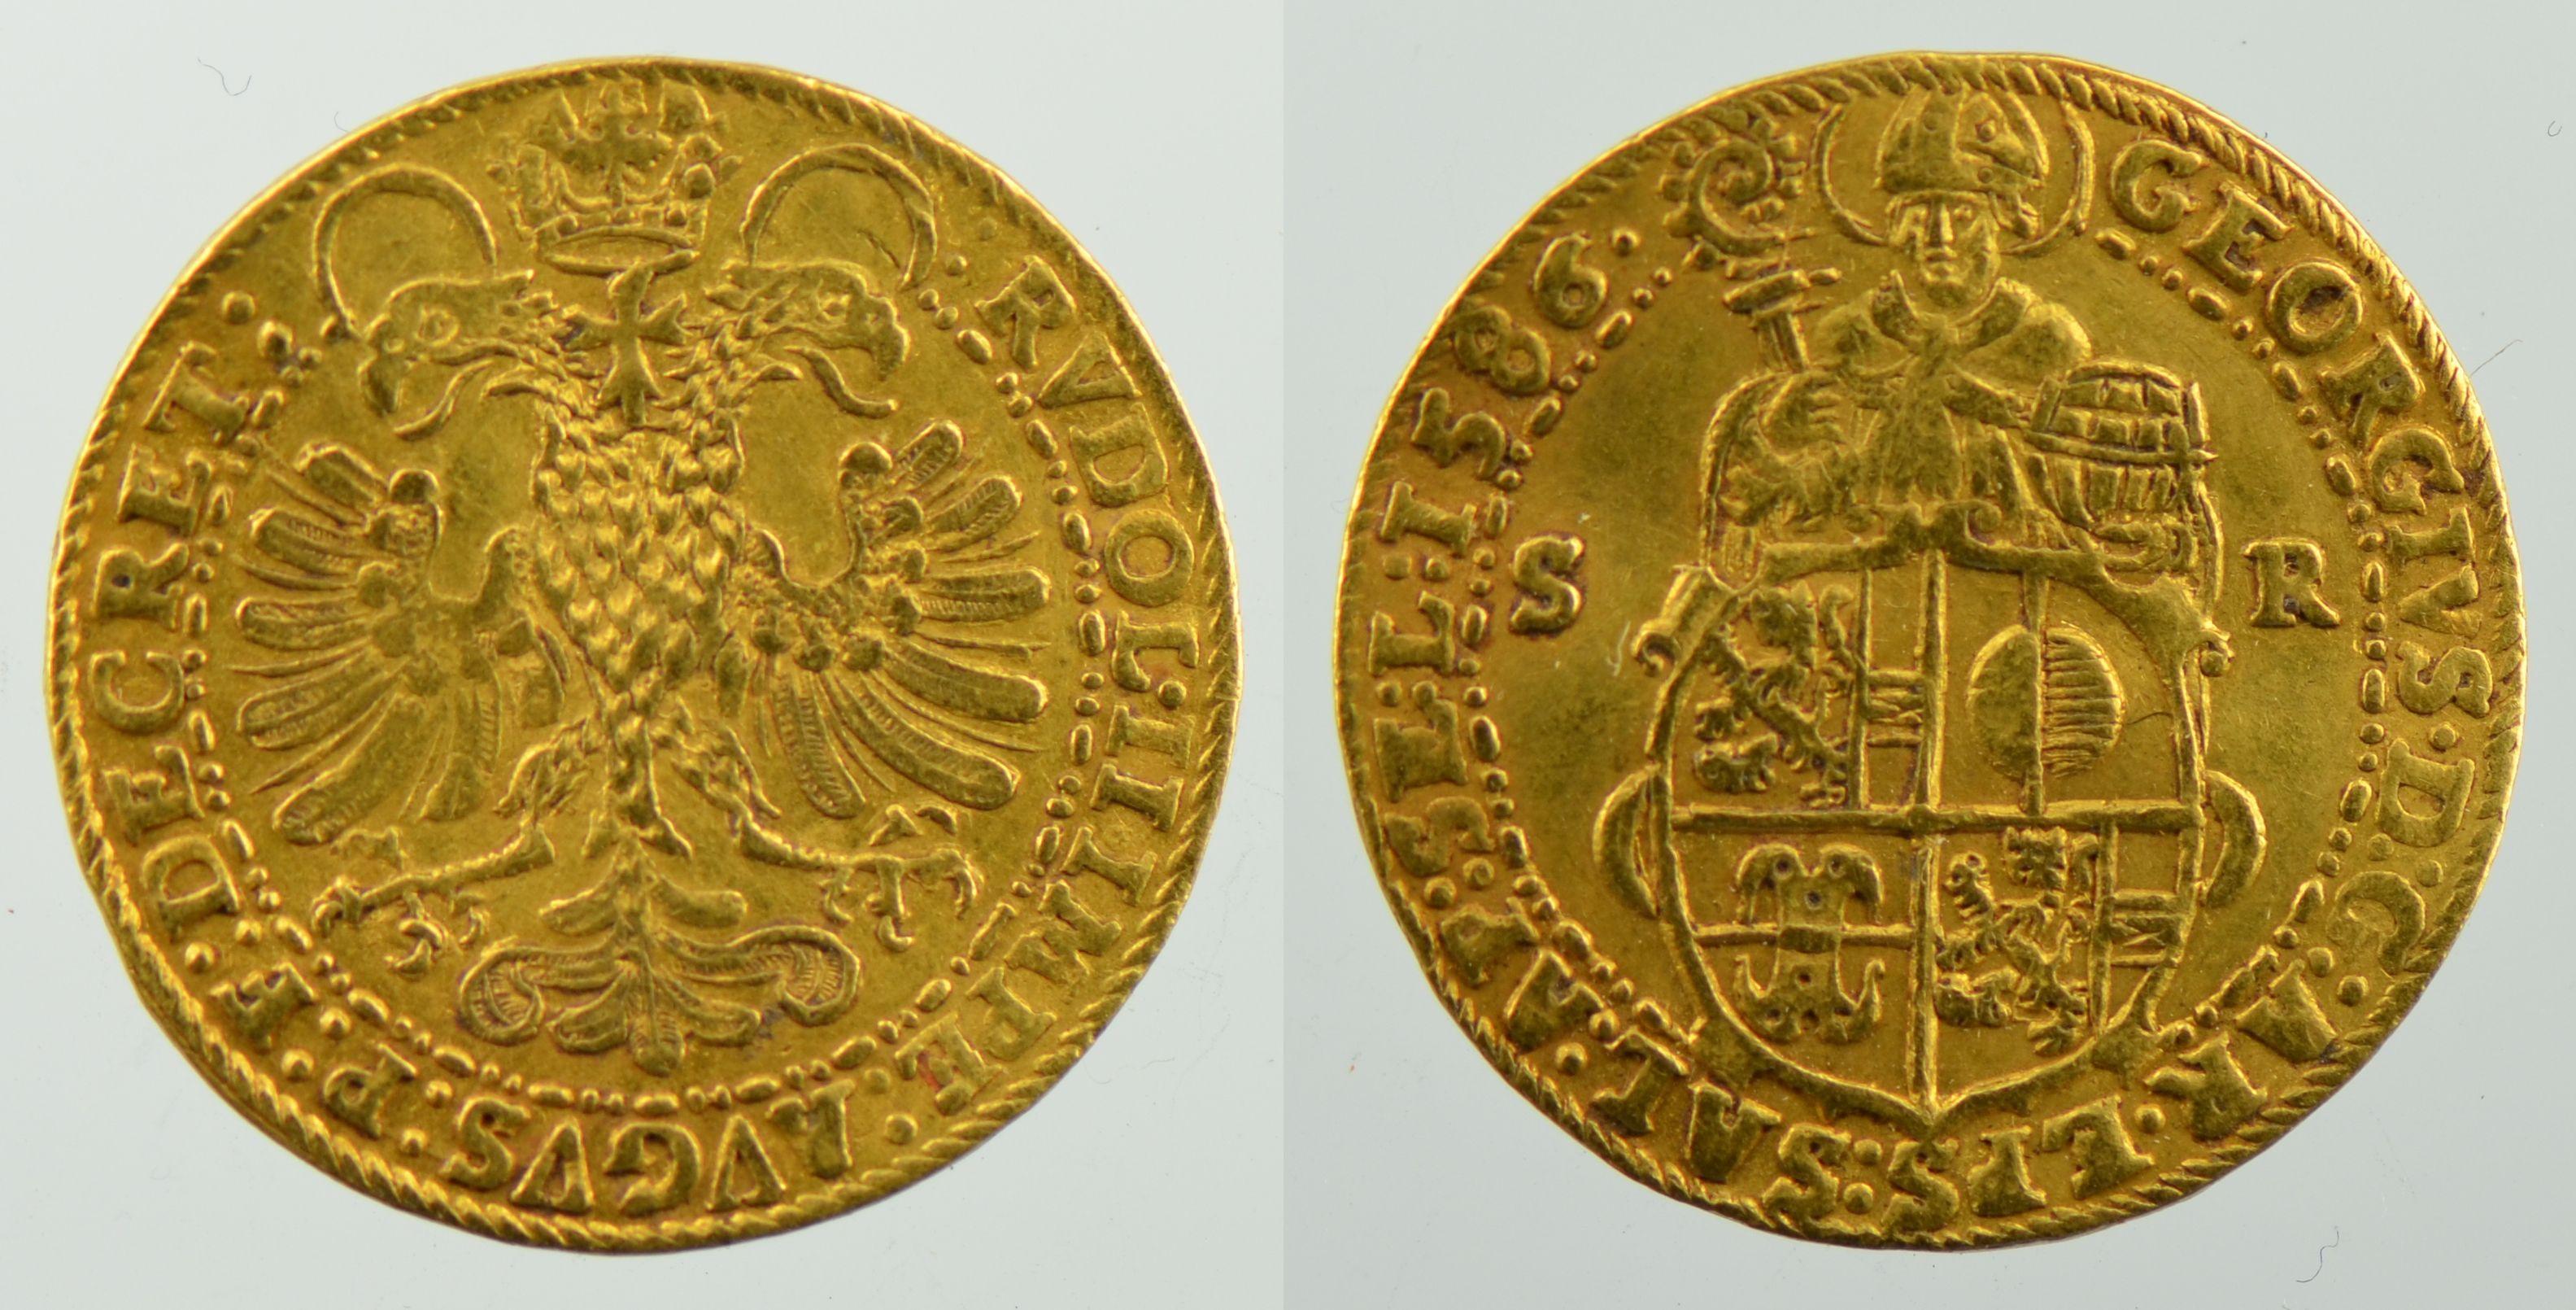 Doppeldukat 1586, Schweizer Nationalmuseum